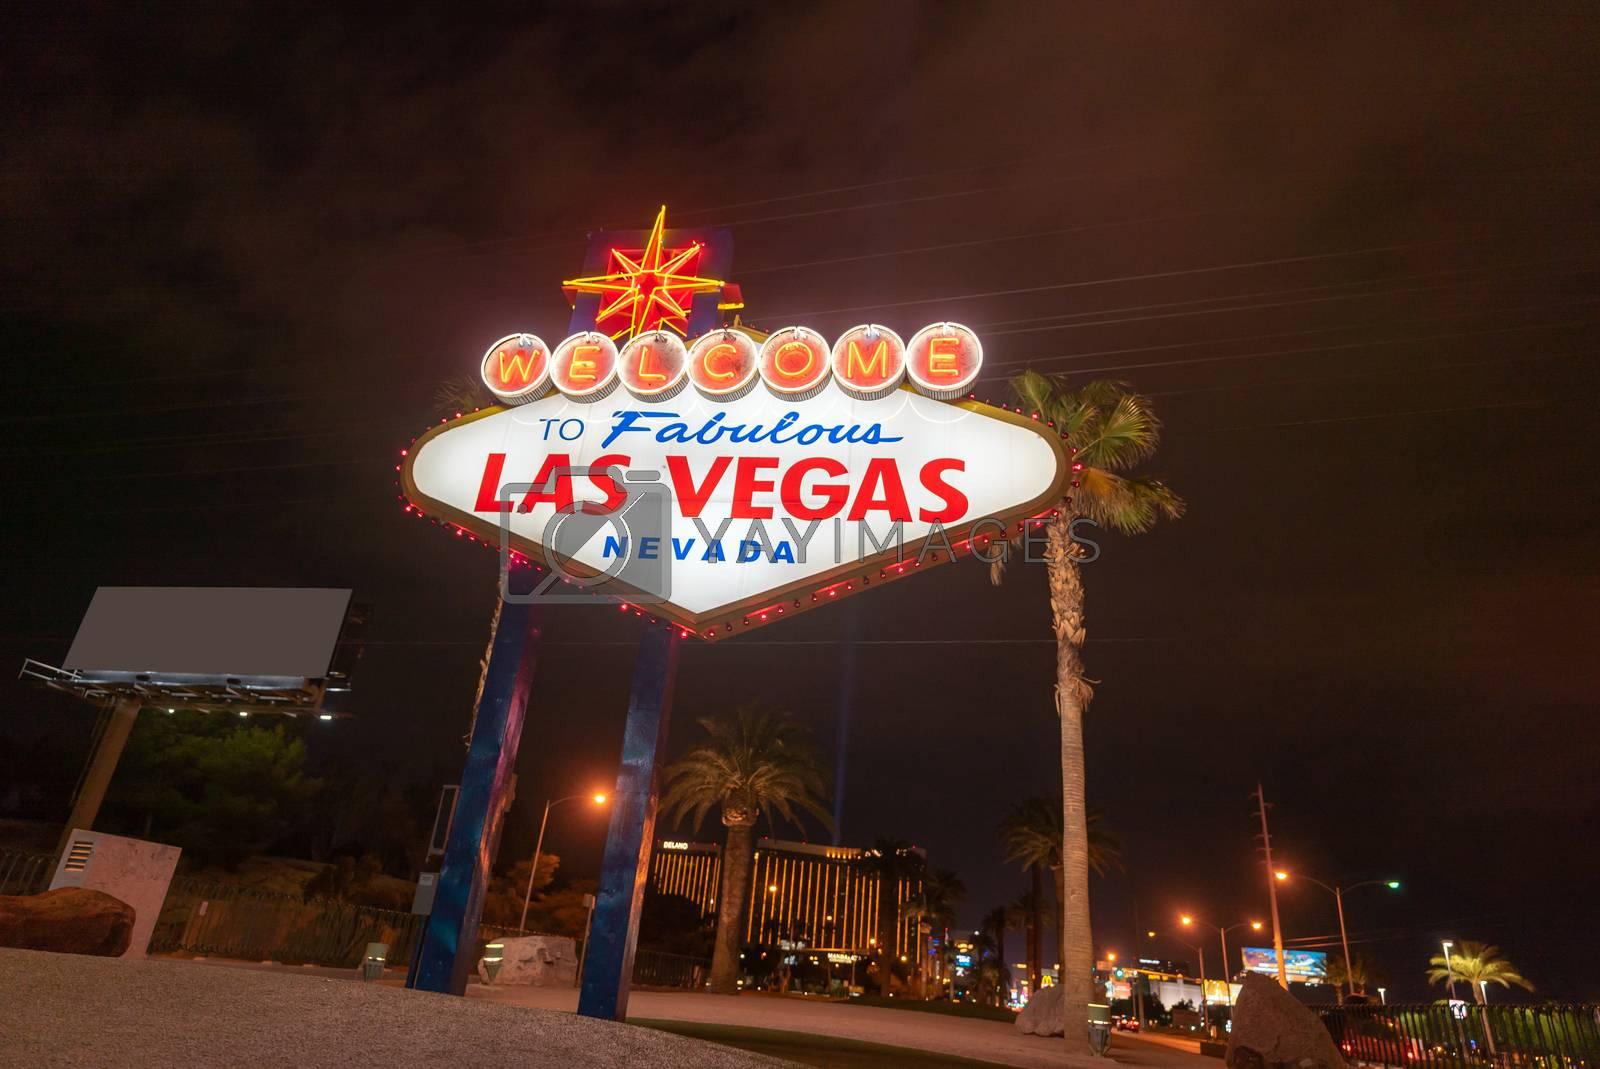 Famous Las Vegas sign at night in Las Vegas city, Nevada, USA